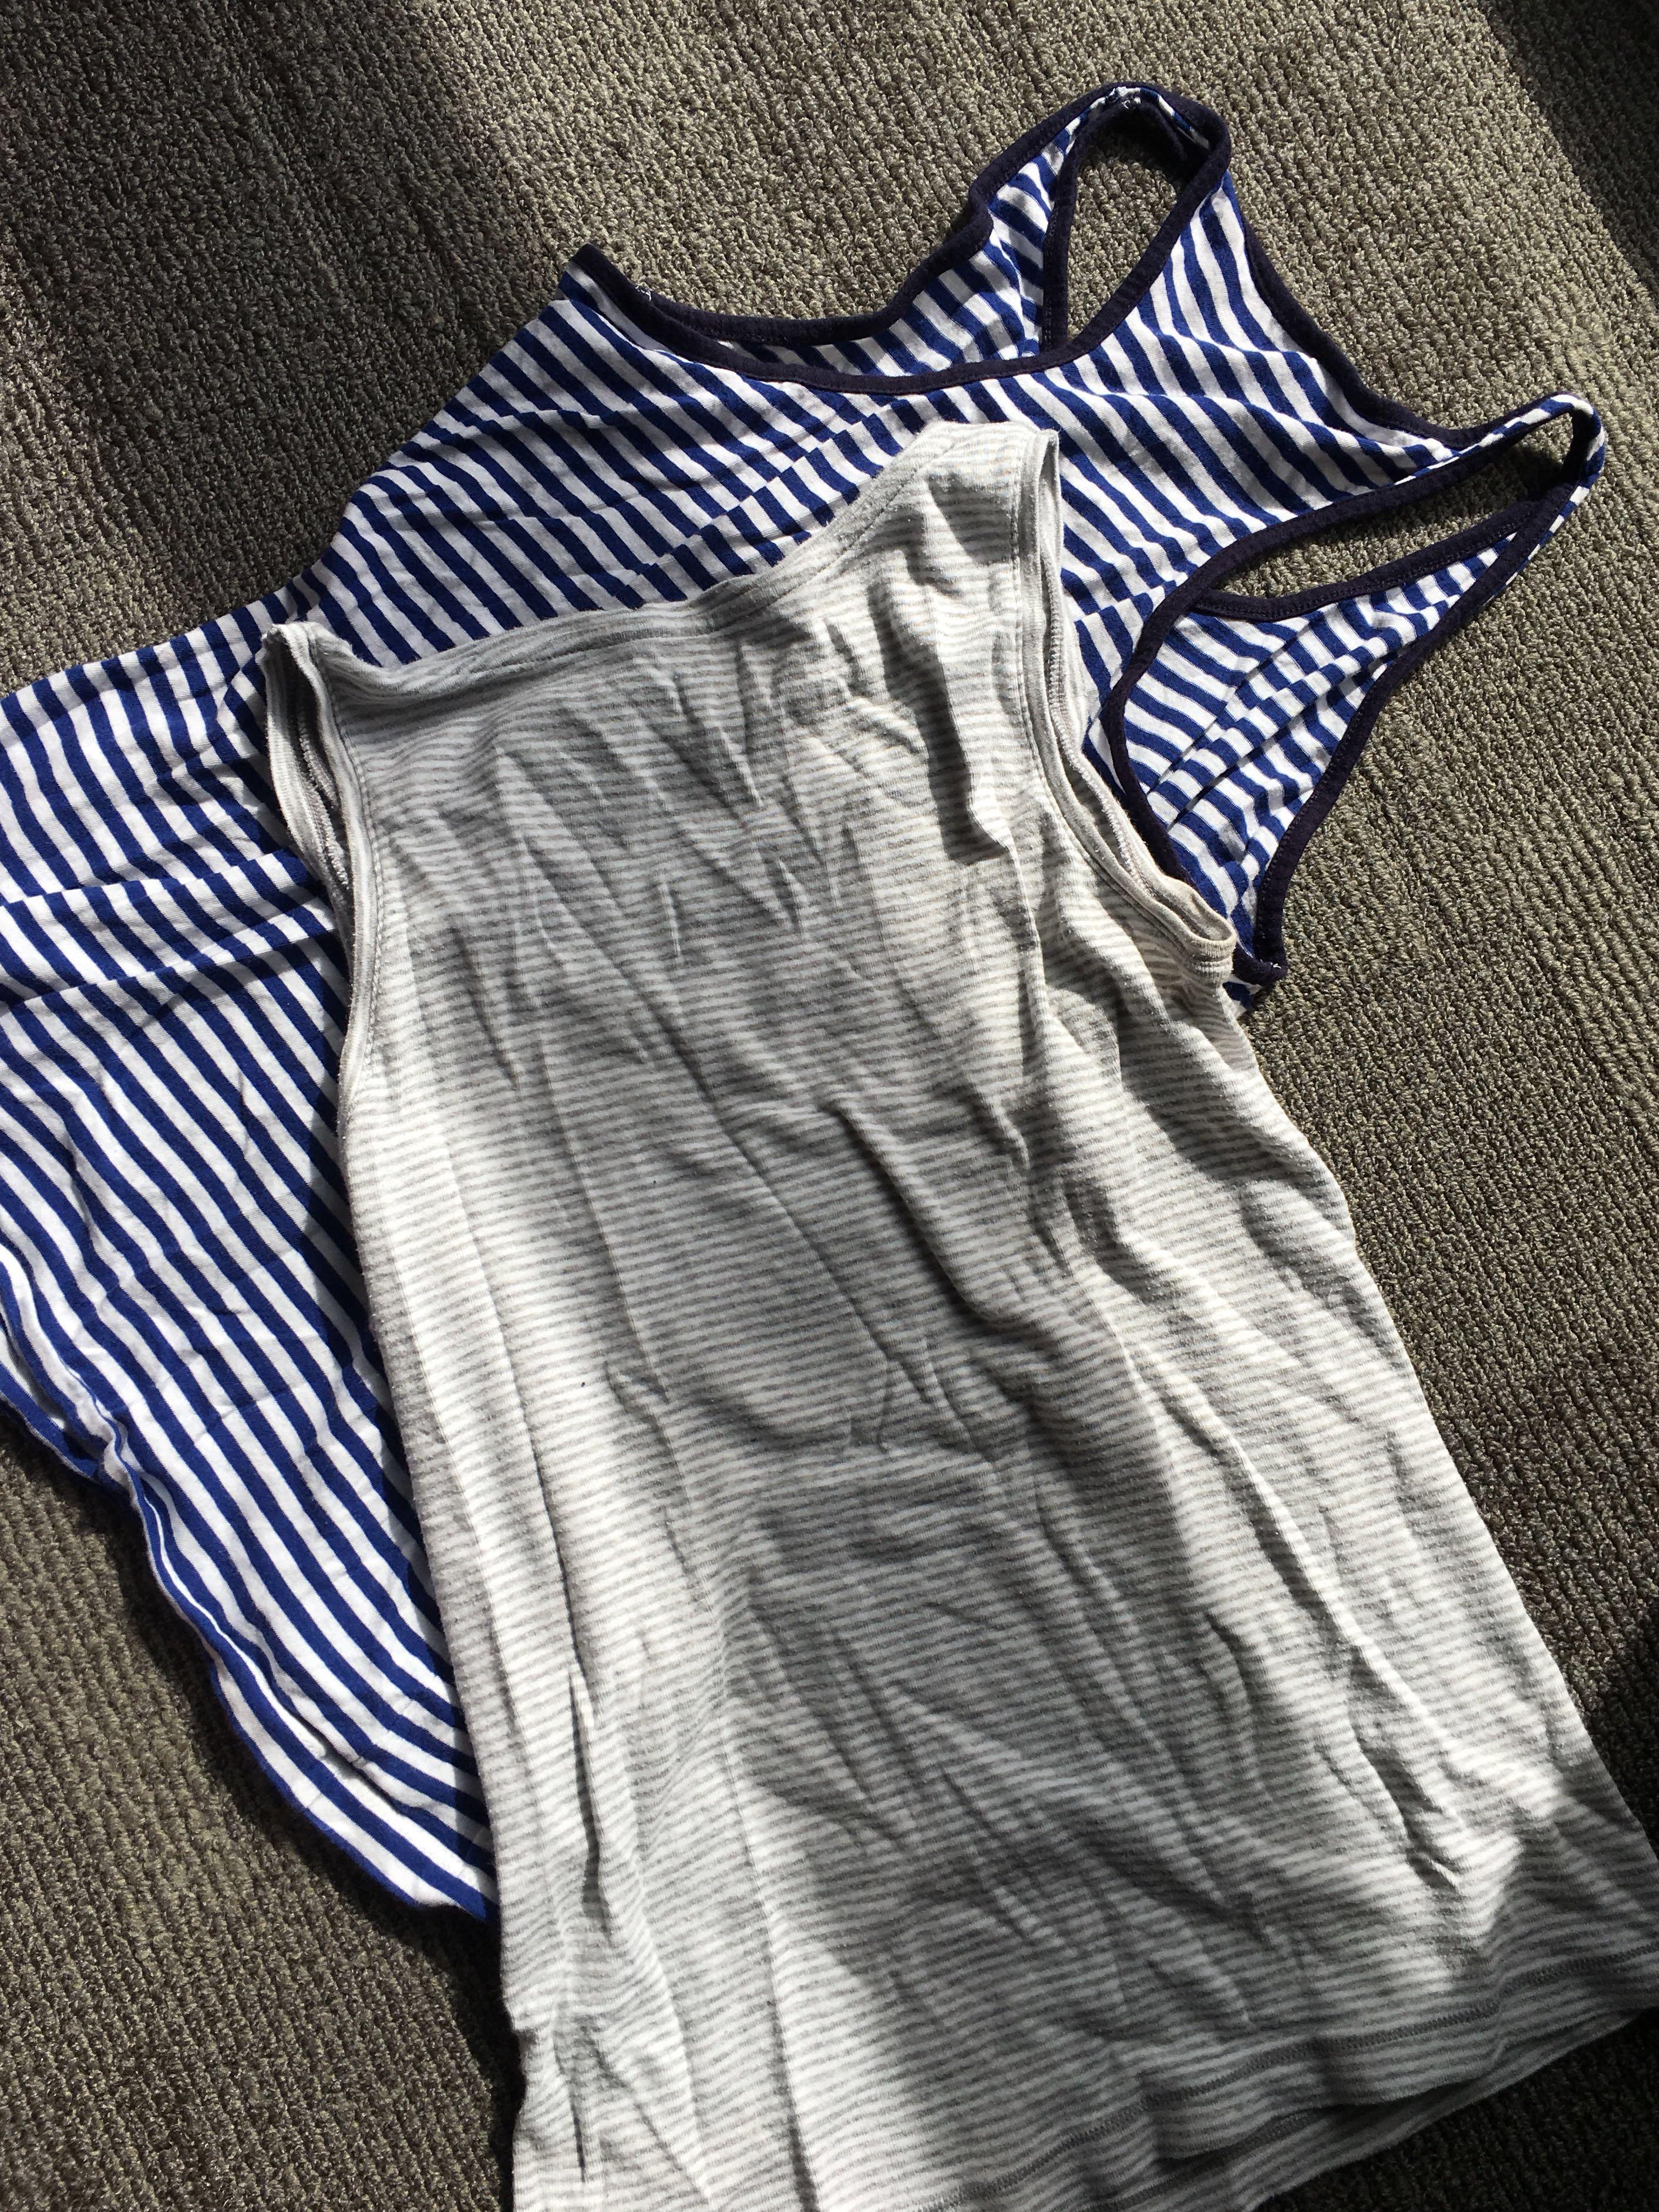 Striped singlets (S/M)